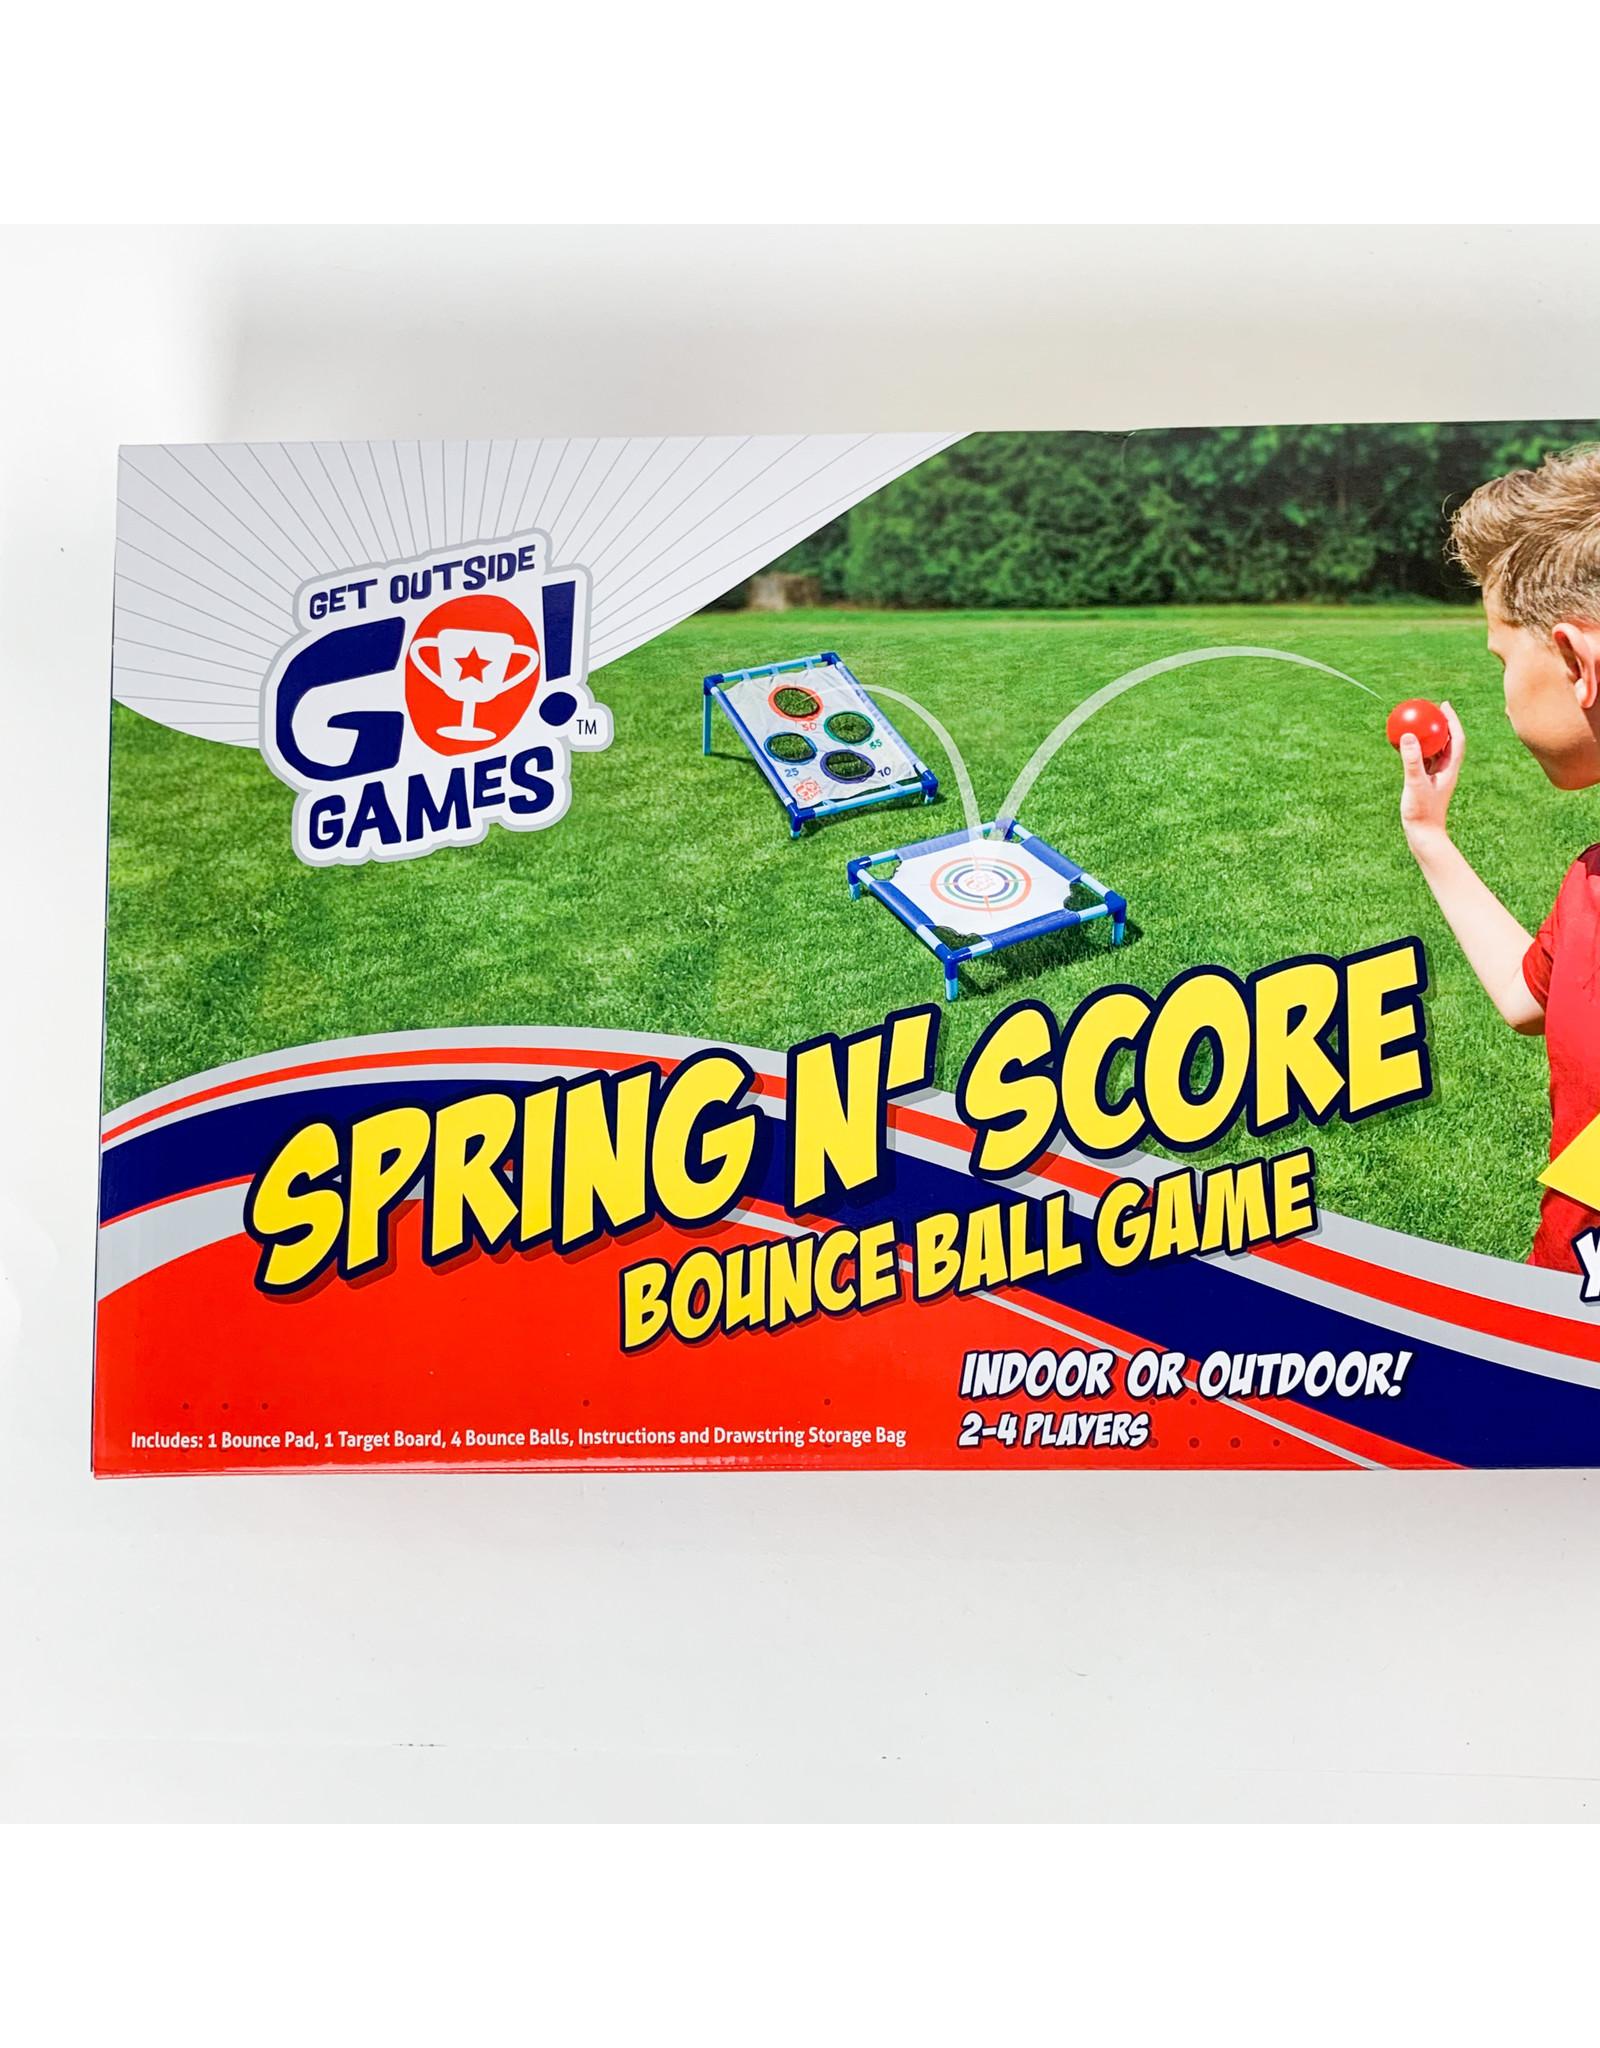 Spring & Score